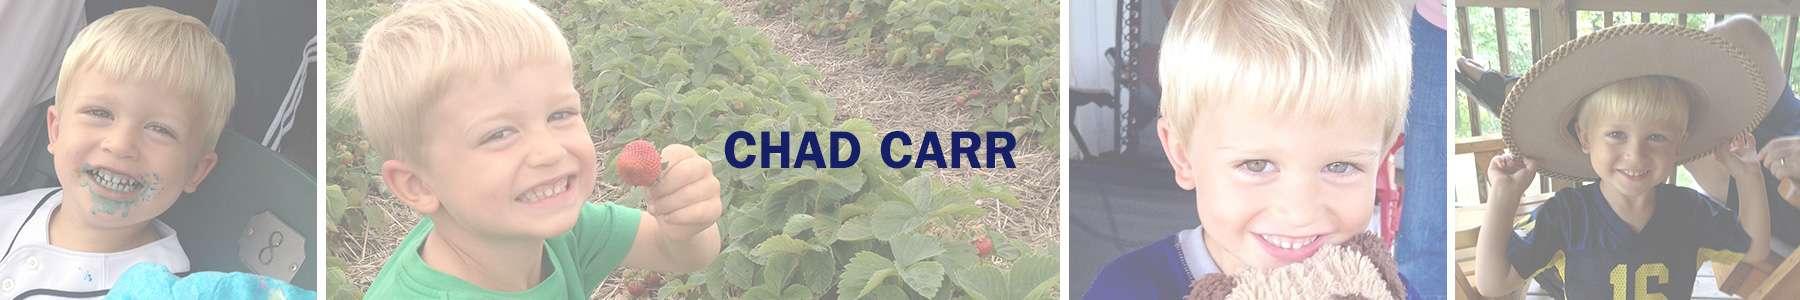 Chad Carr